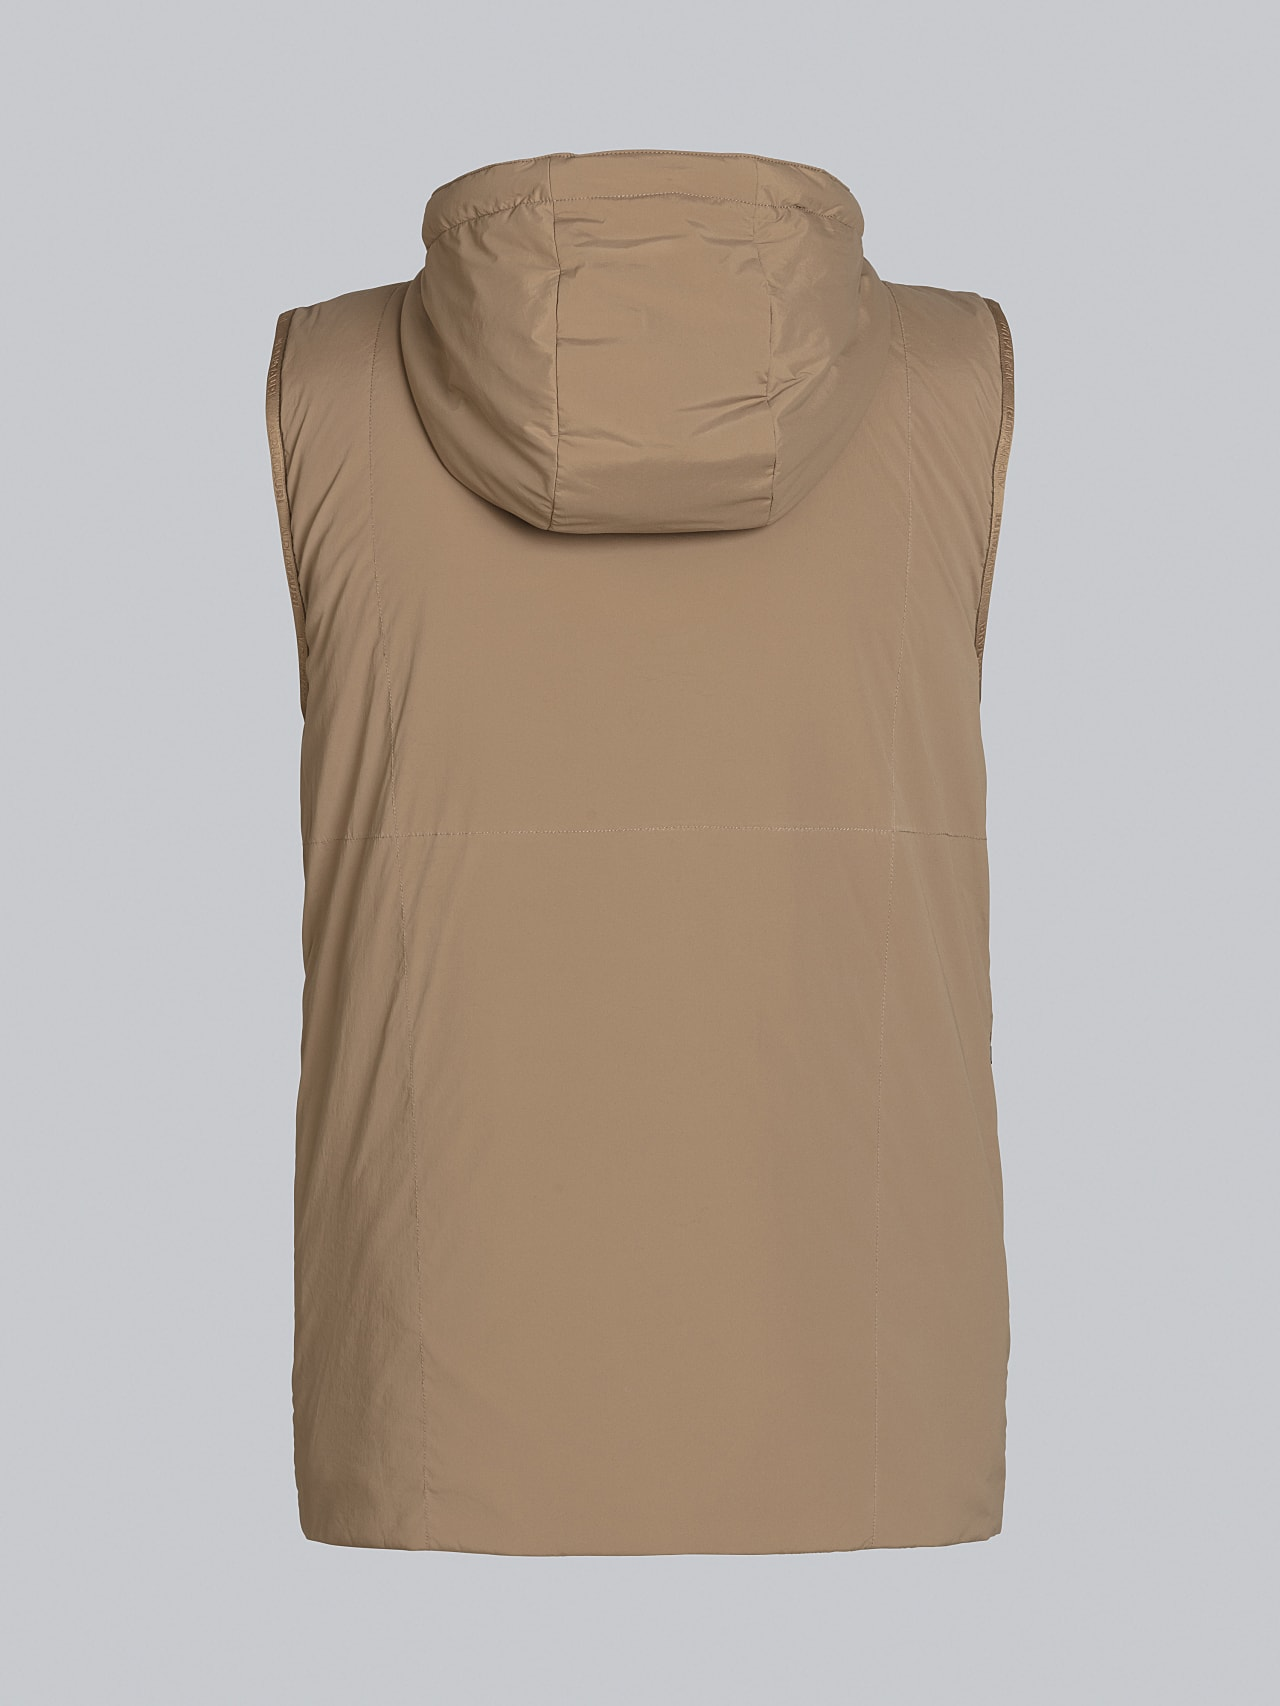 FELIP V1.Y5.02 Water-Repellent Knit Blazer gold Extra Alpha Tauri